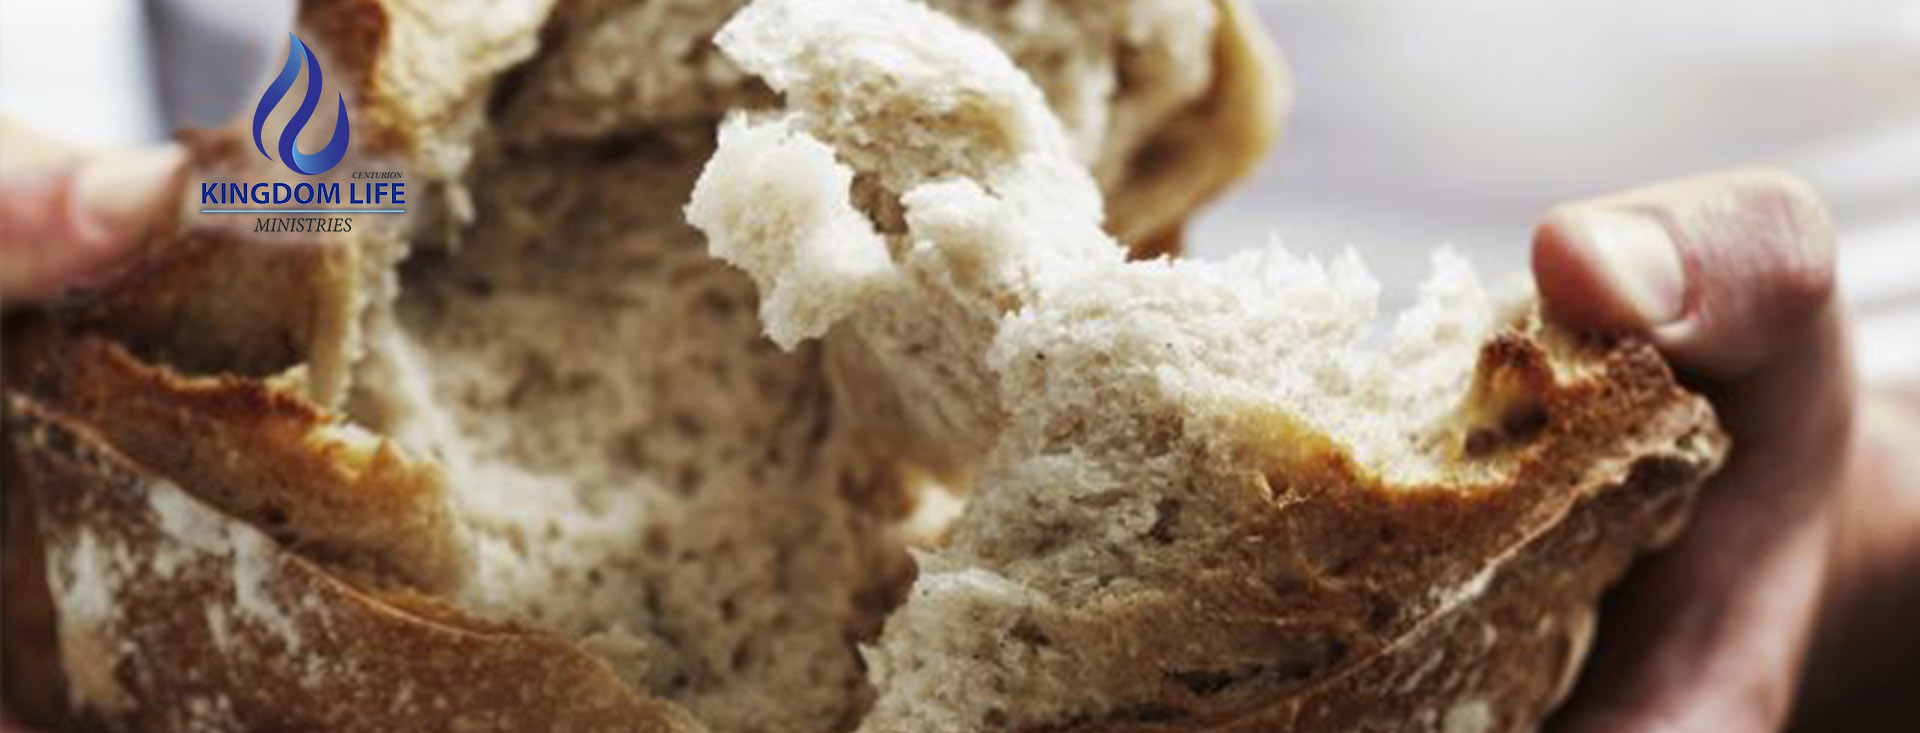 Centurion Kingdom Life Ministries Breaking of bread slider